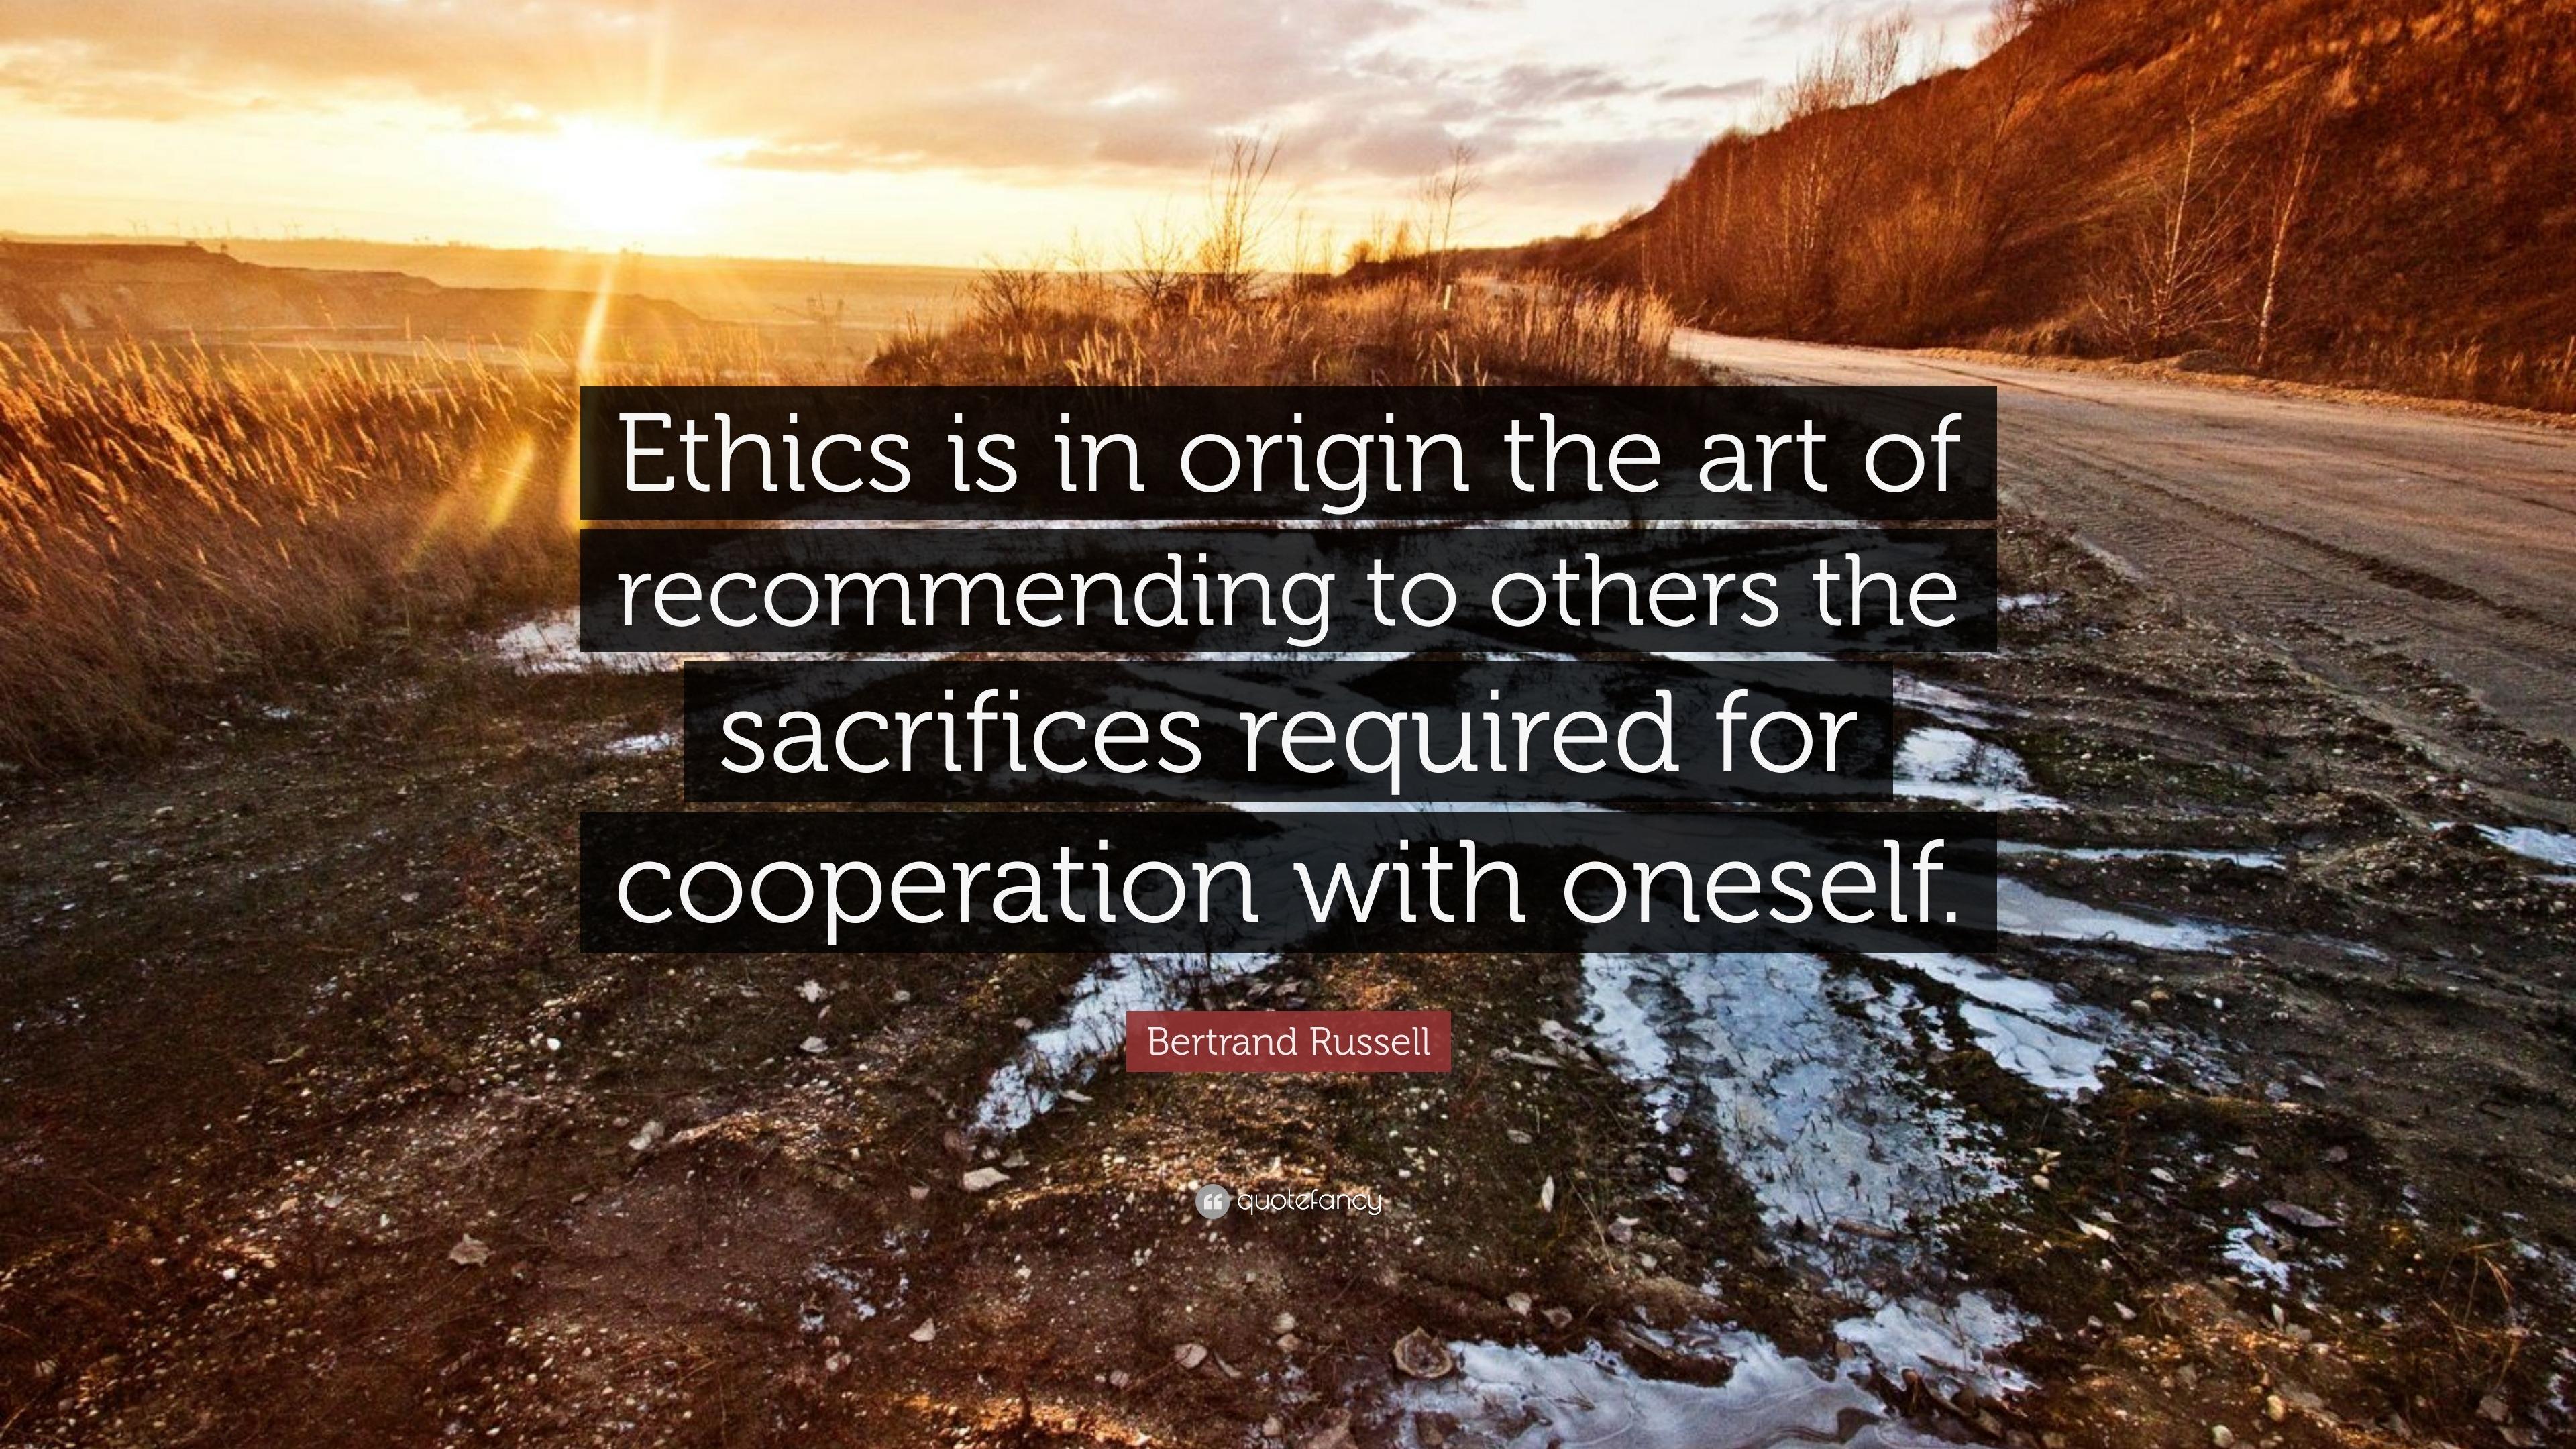 origin and nature of ethics